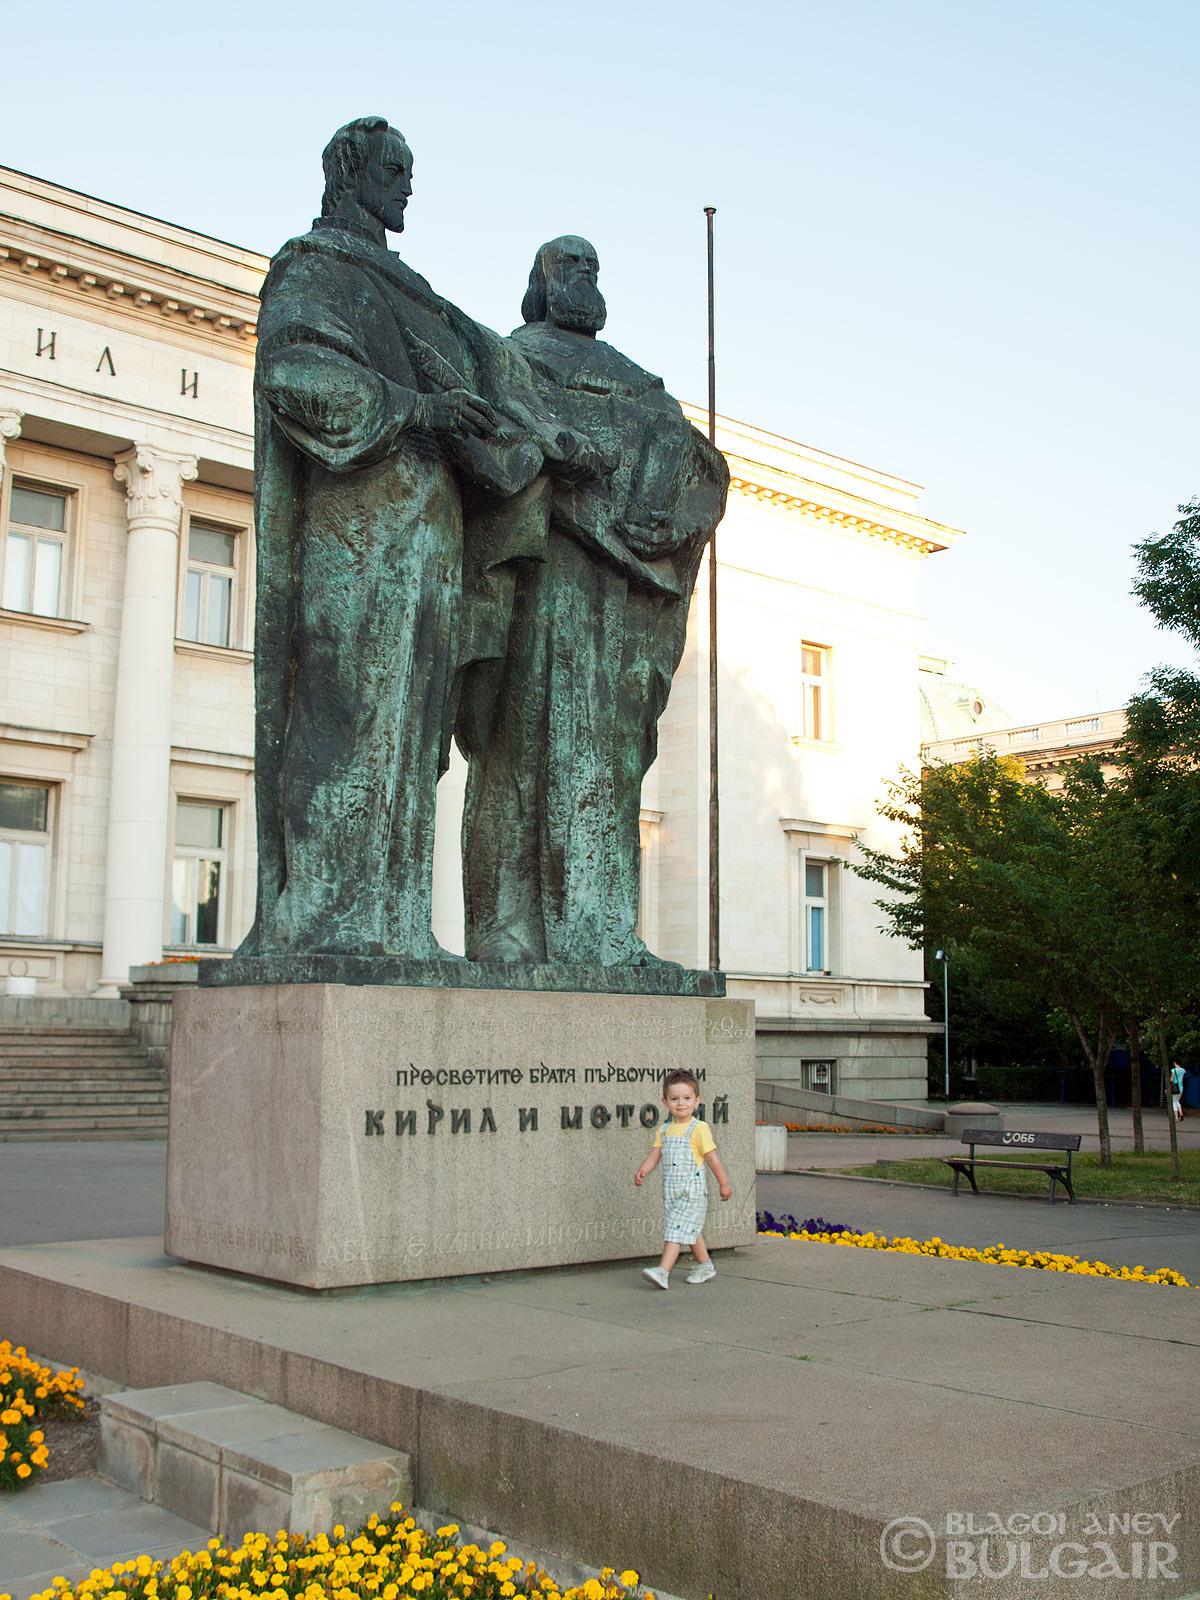 http://image.nauka.bg/kul/pametnici/KiM/KiM3.jpg